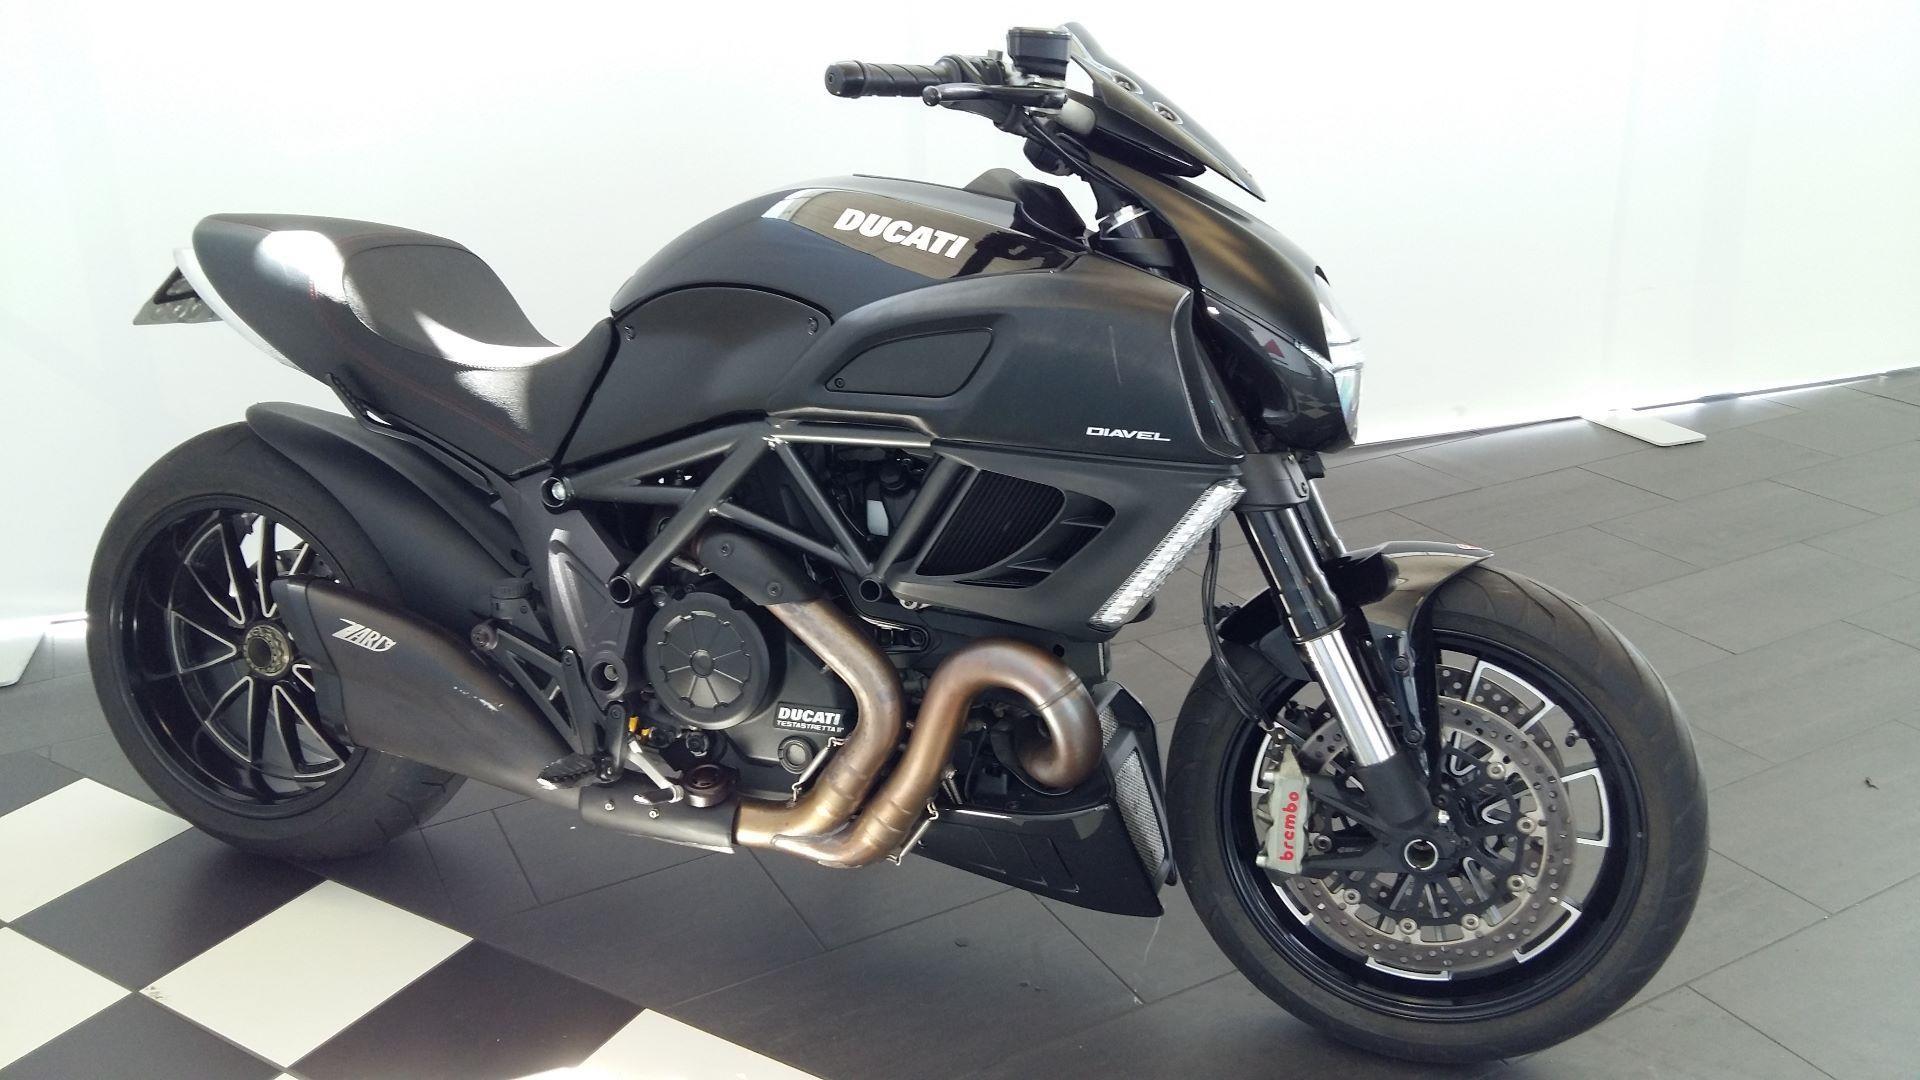 moto occasions acheter ducati 1198 diavel abs moto77 ag frauenfeld. Black Bedroom Furniture Sets. Home Design Ideas